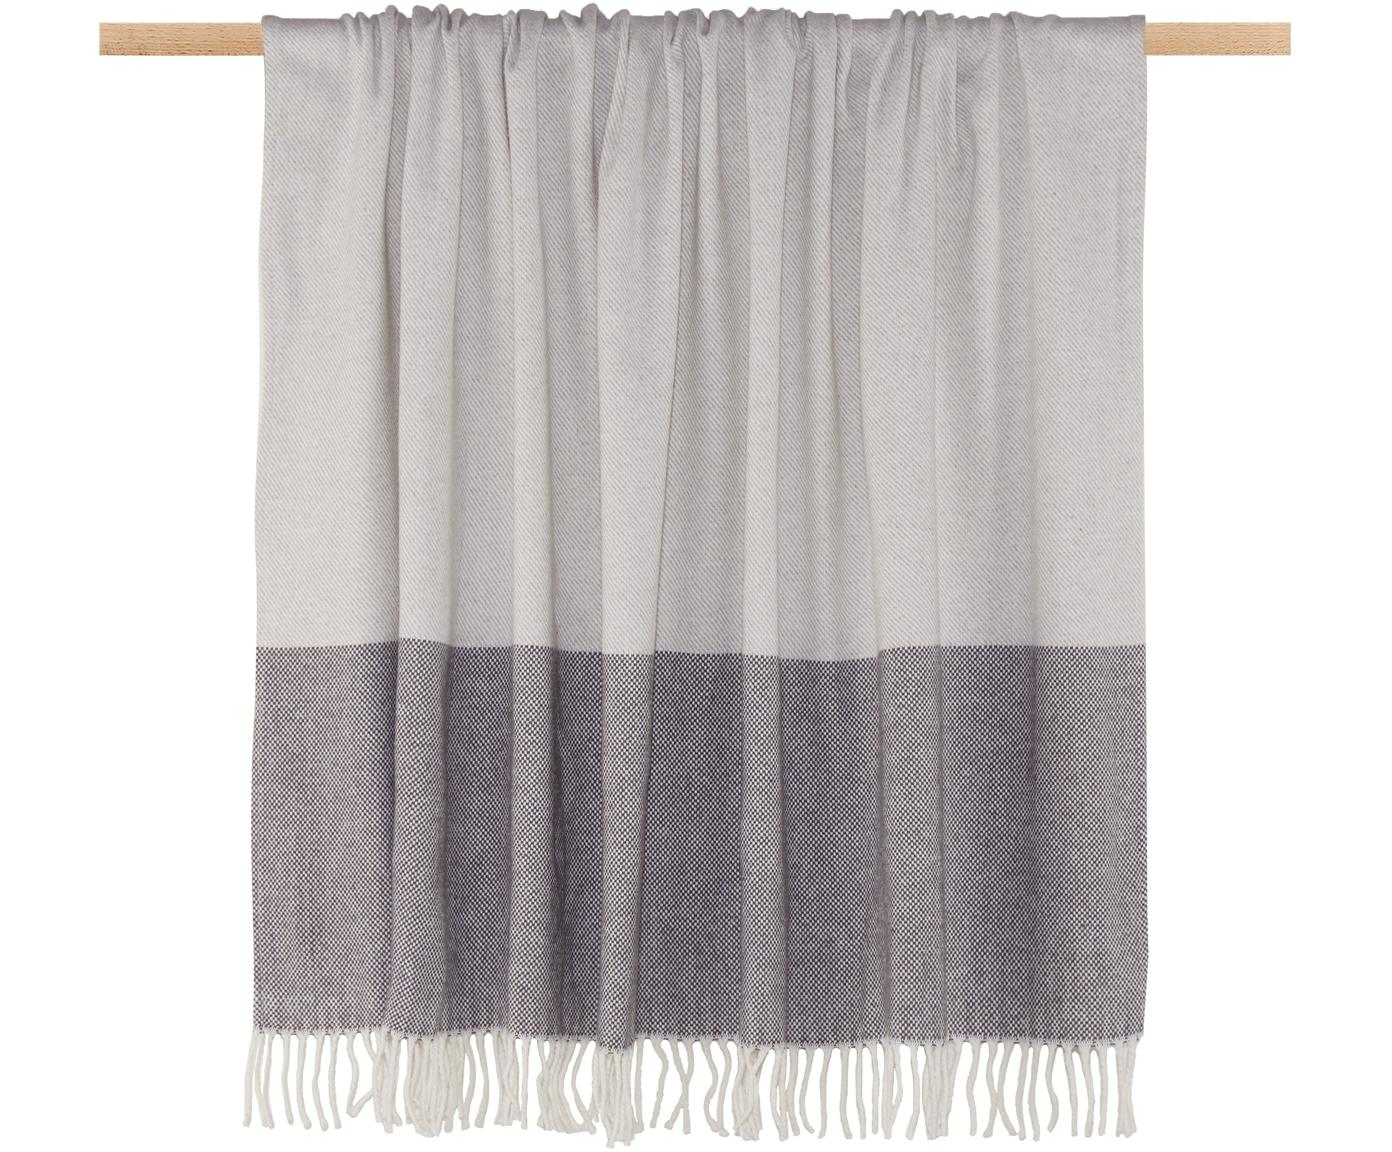 Plaid Stripes, 50% katoen, 50% polyacryl, Grijstinten, 150 x 200 cm